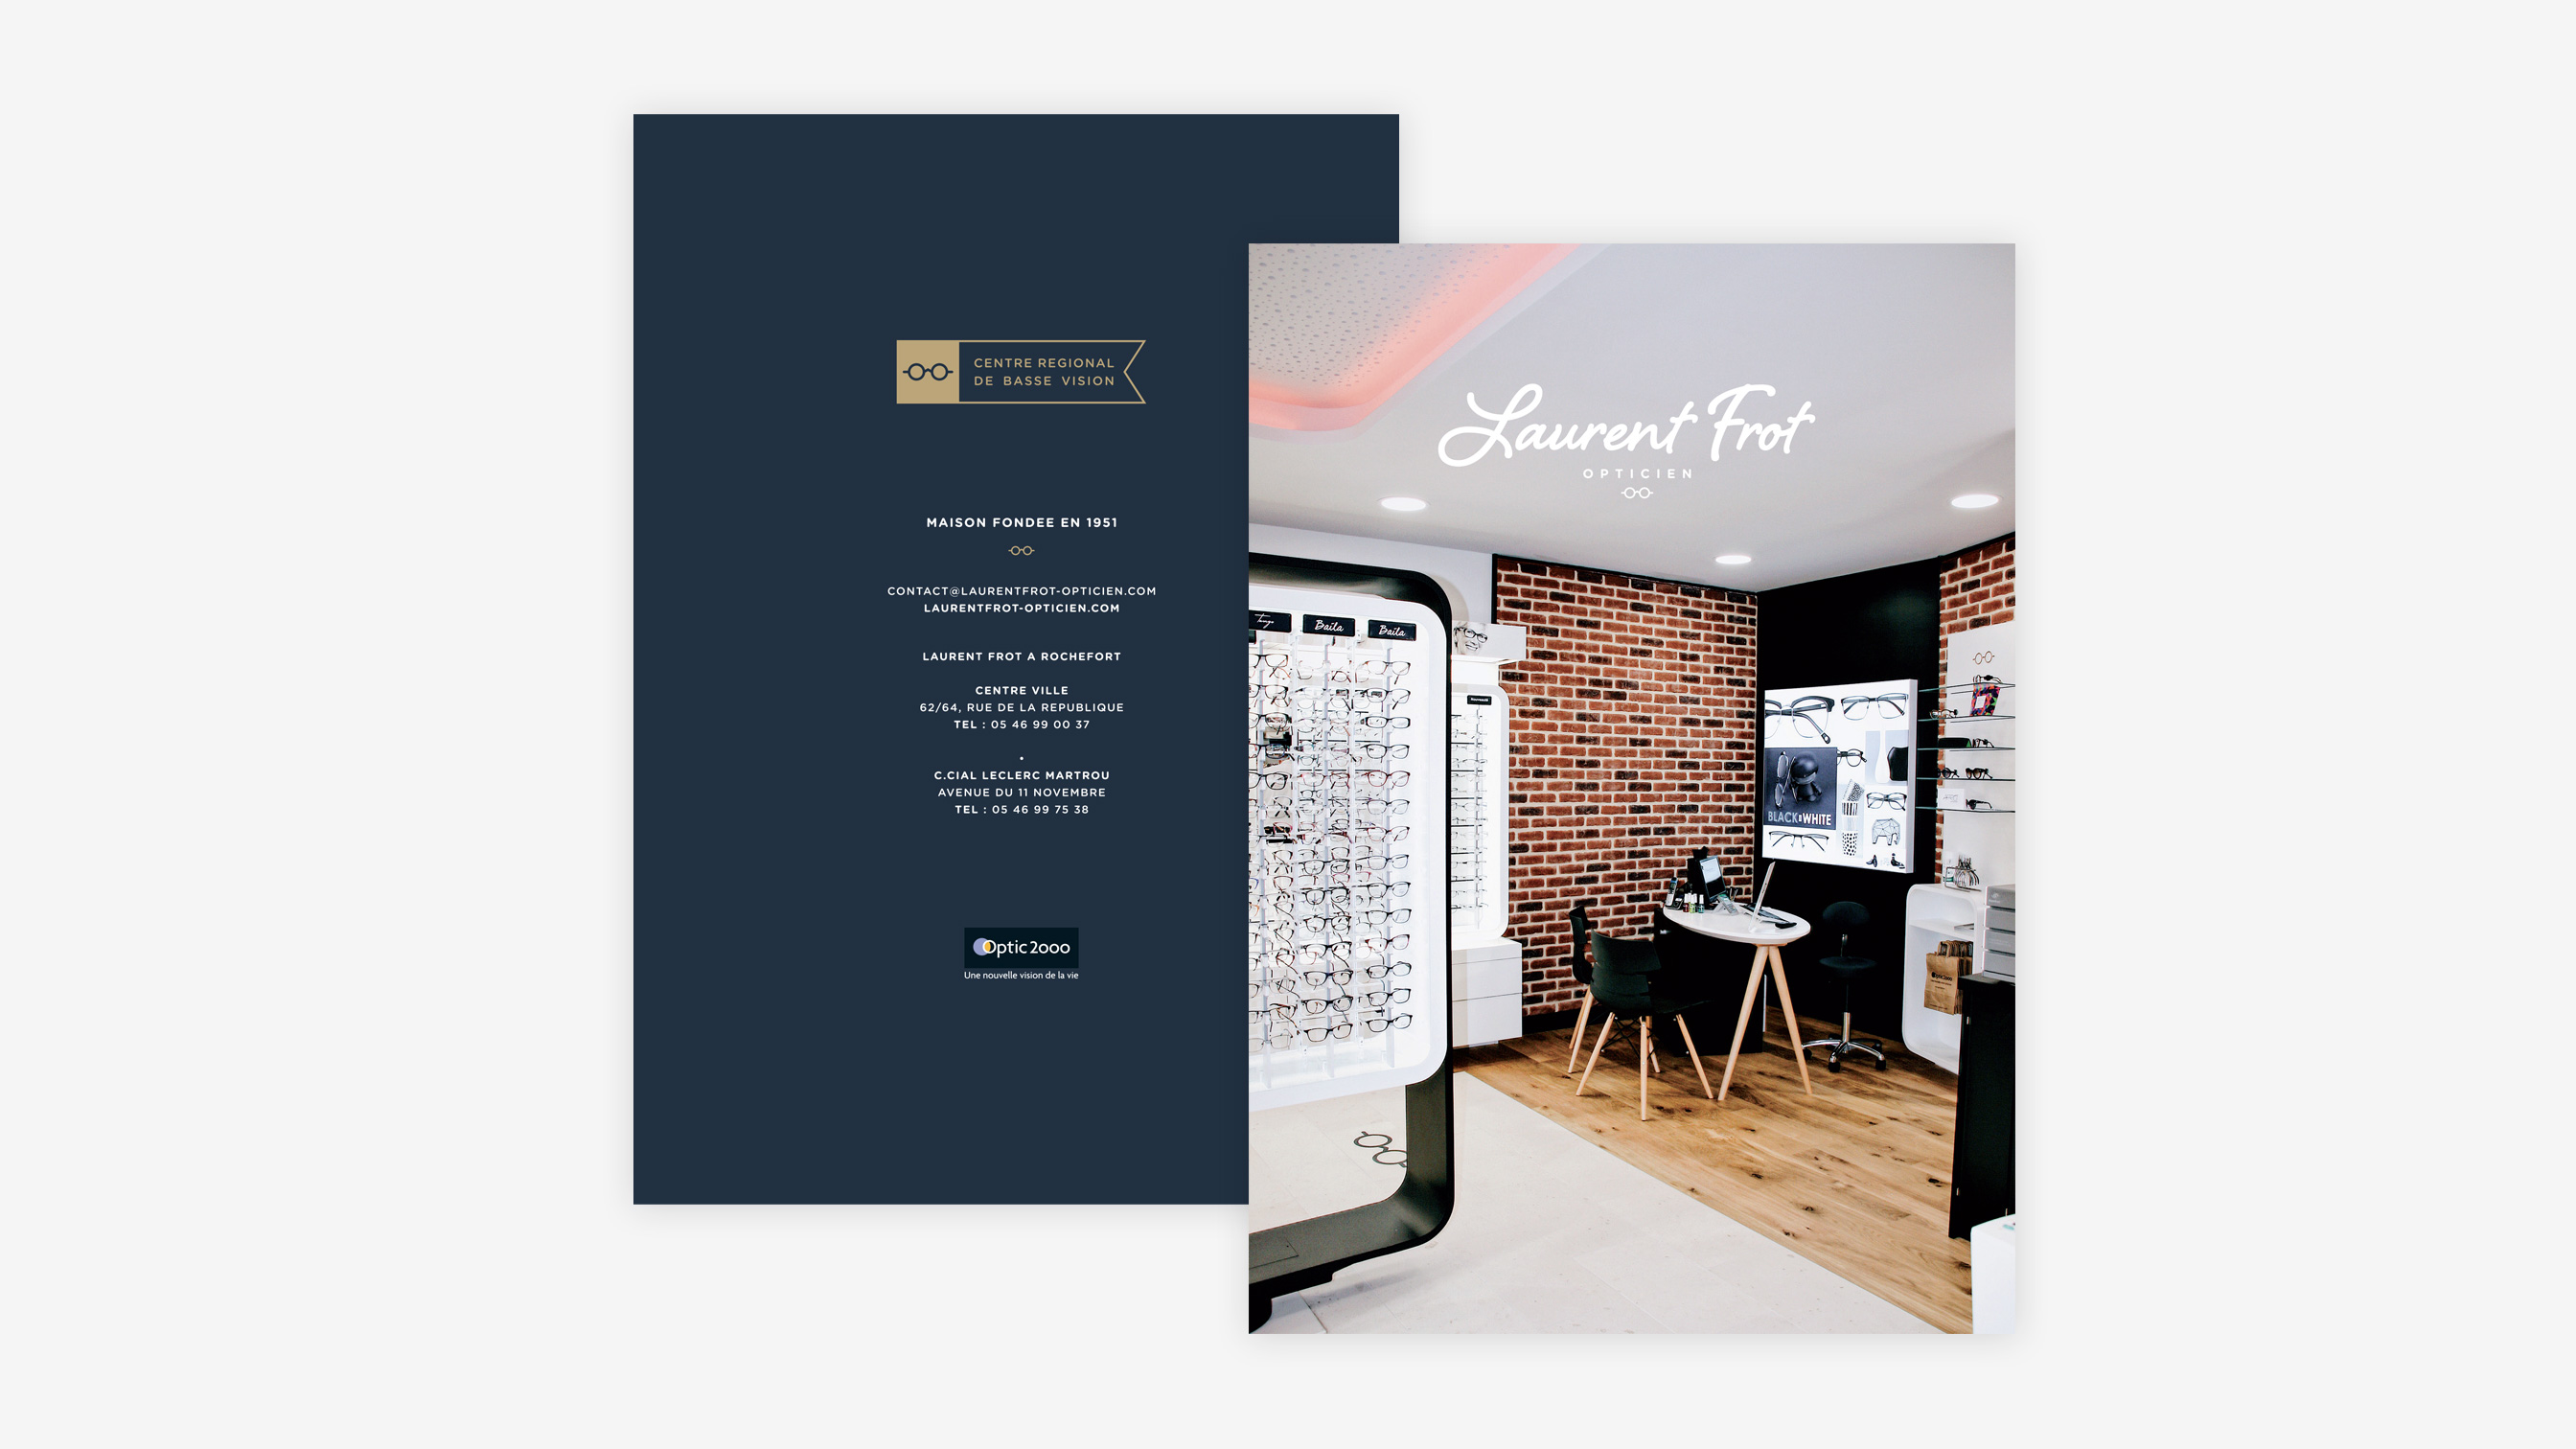 09-laurent-frot-opticien-pikteo-webdesign-graphic-design-freelance-paris-bruxelles-londres